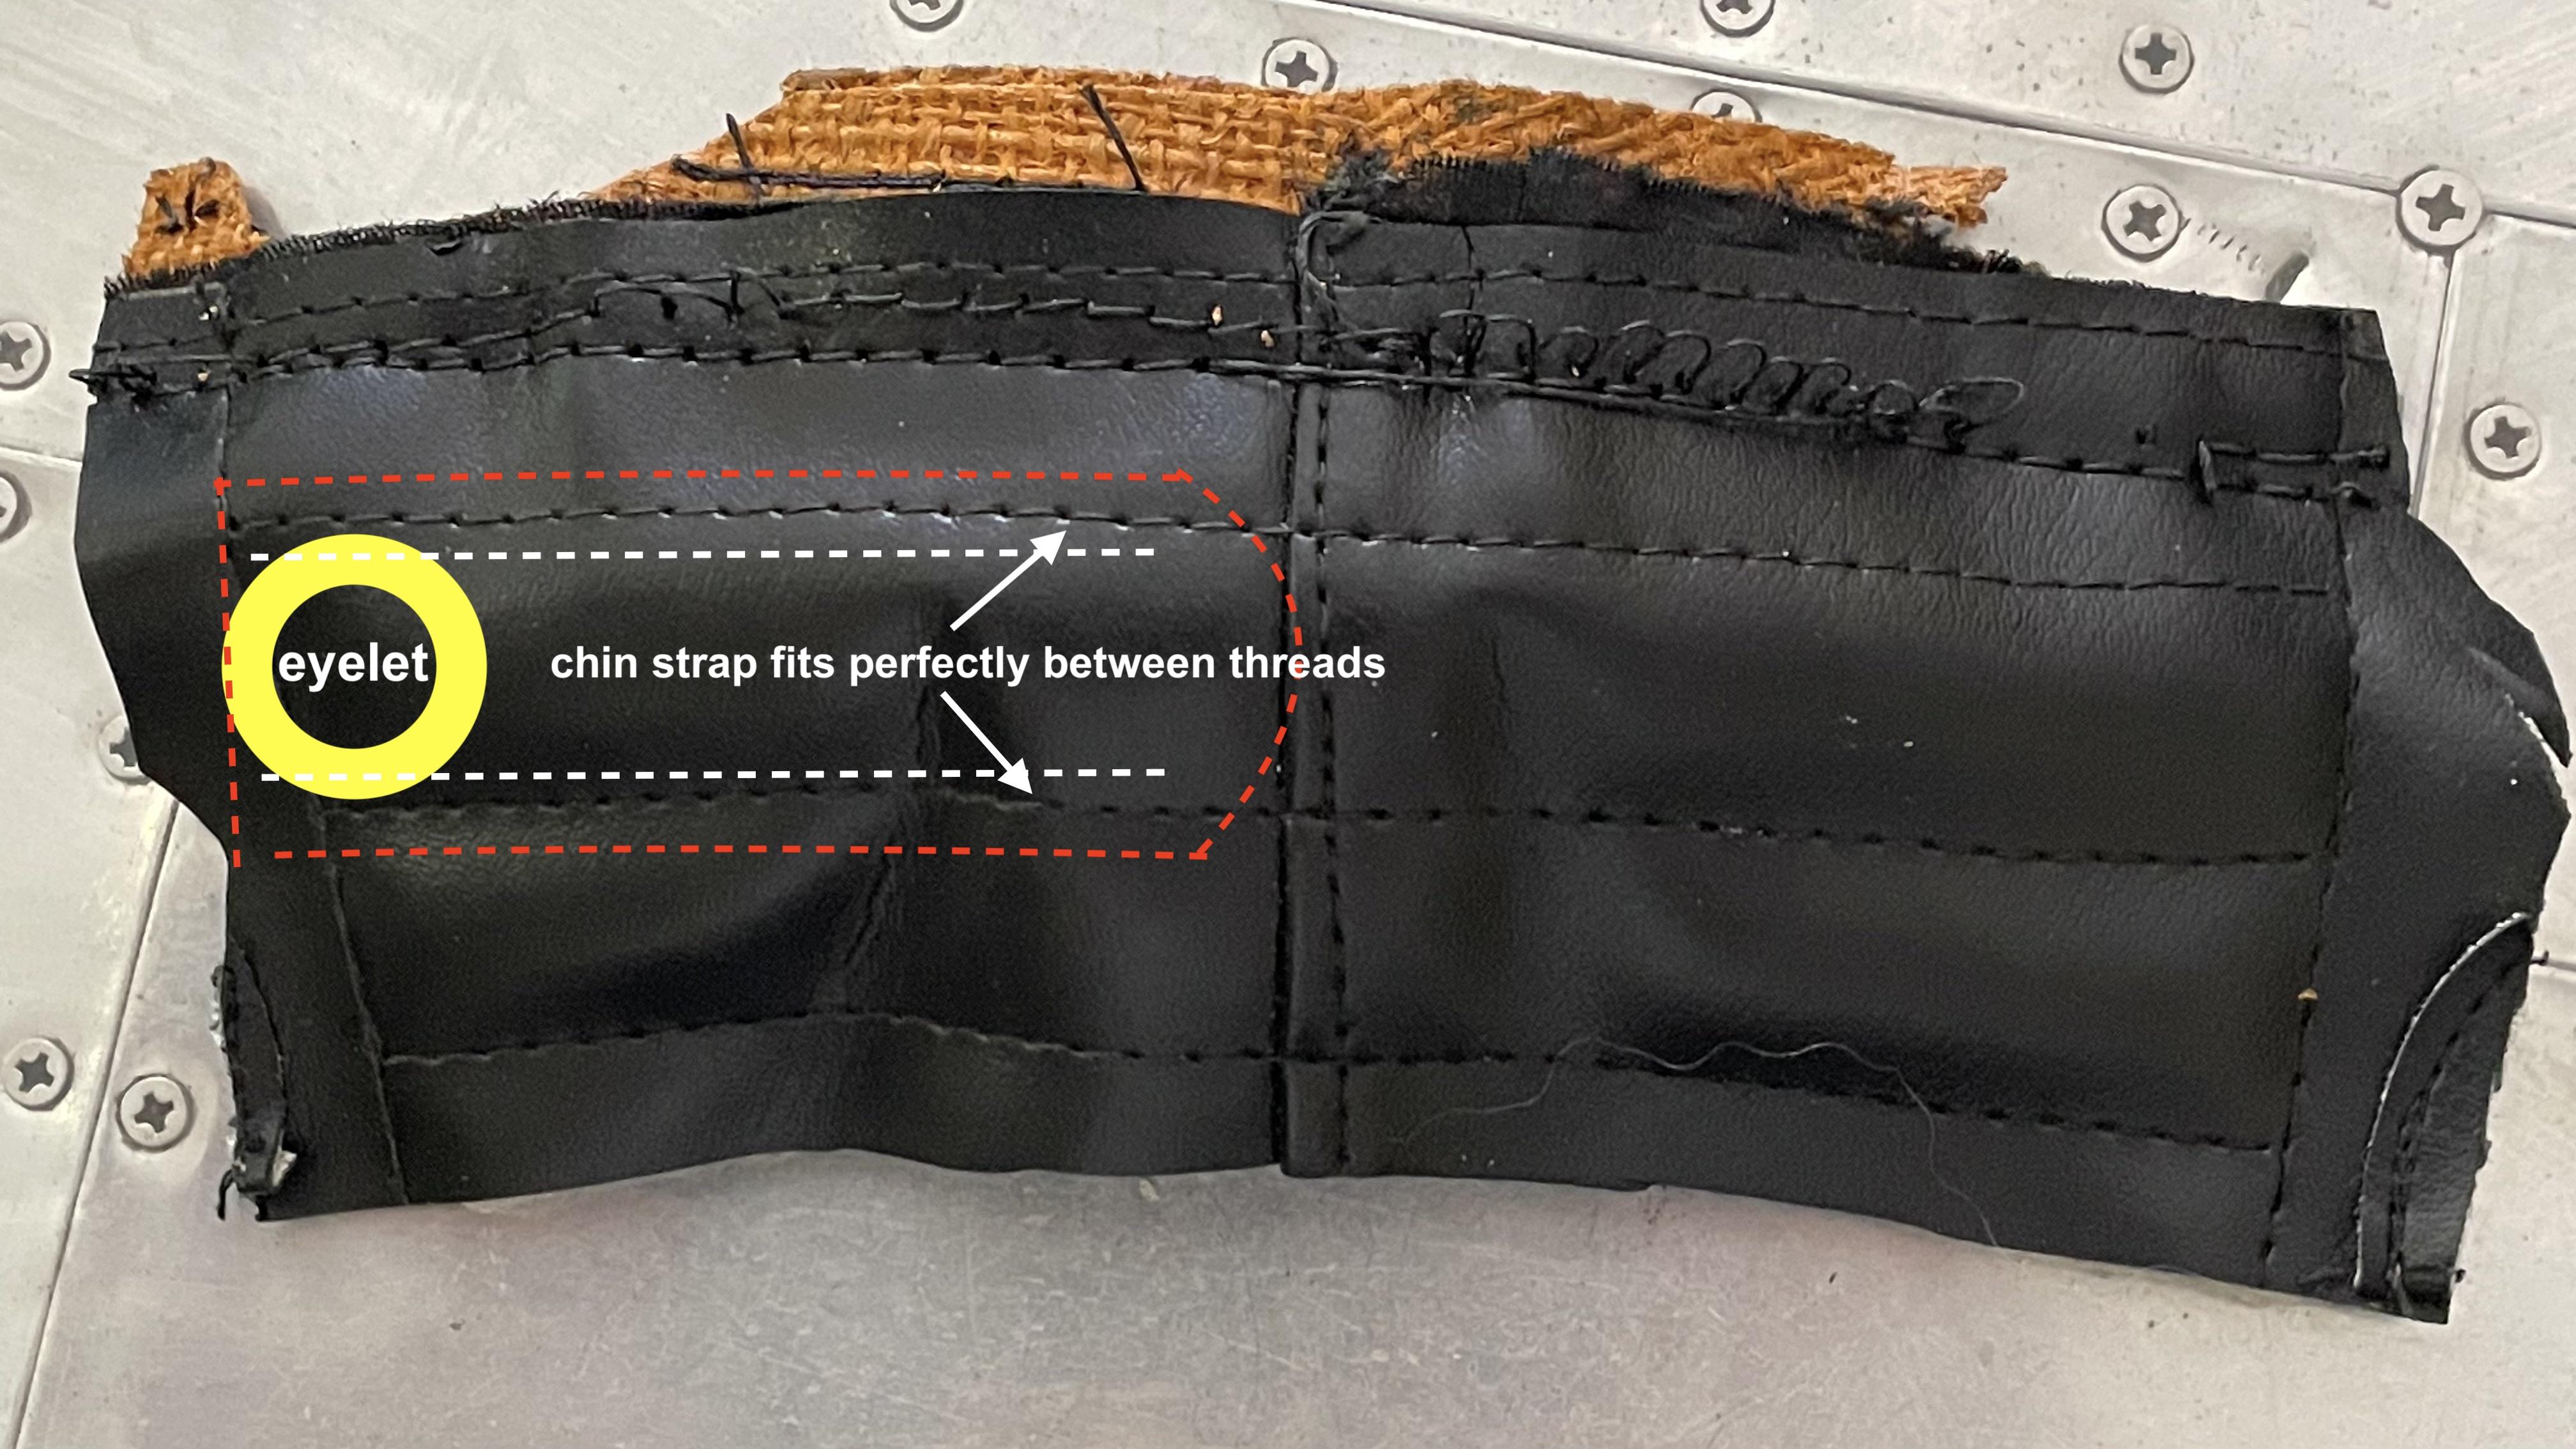 ESB left leather strap source.jpg